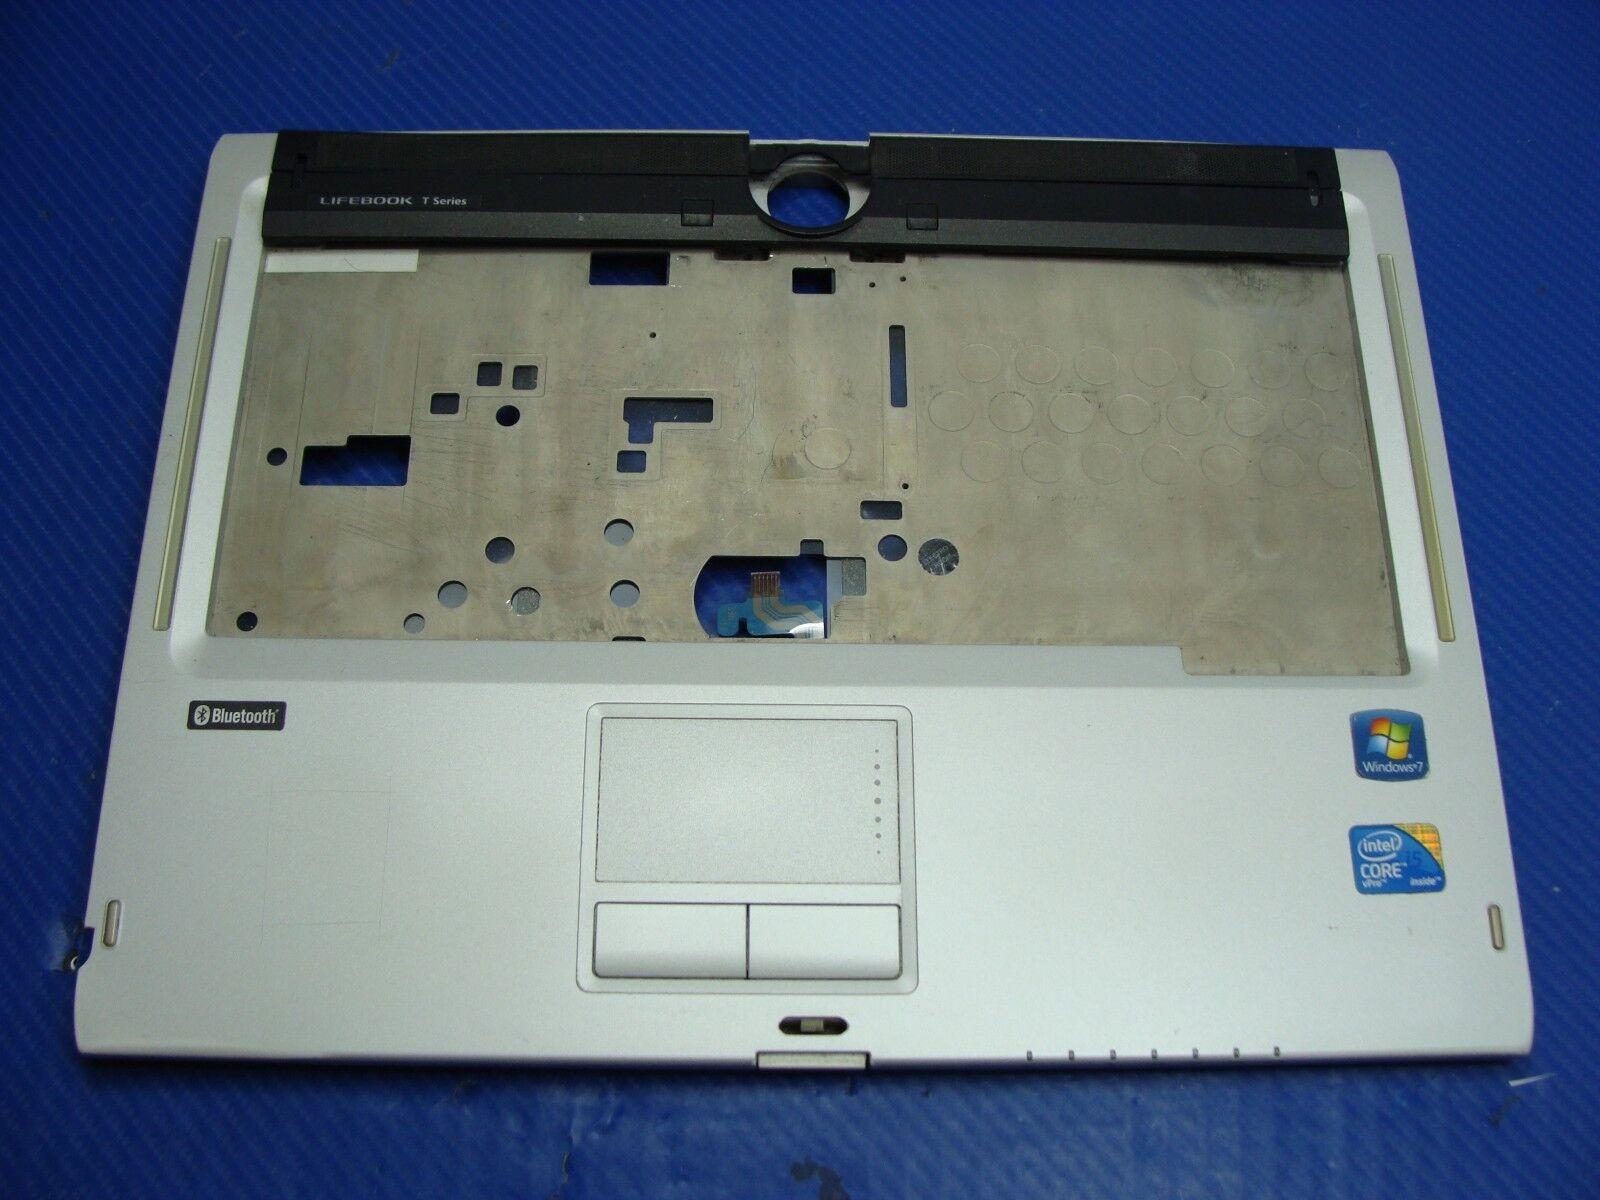 Fujitsu Lifebook T900 13.3